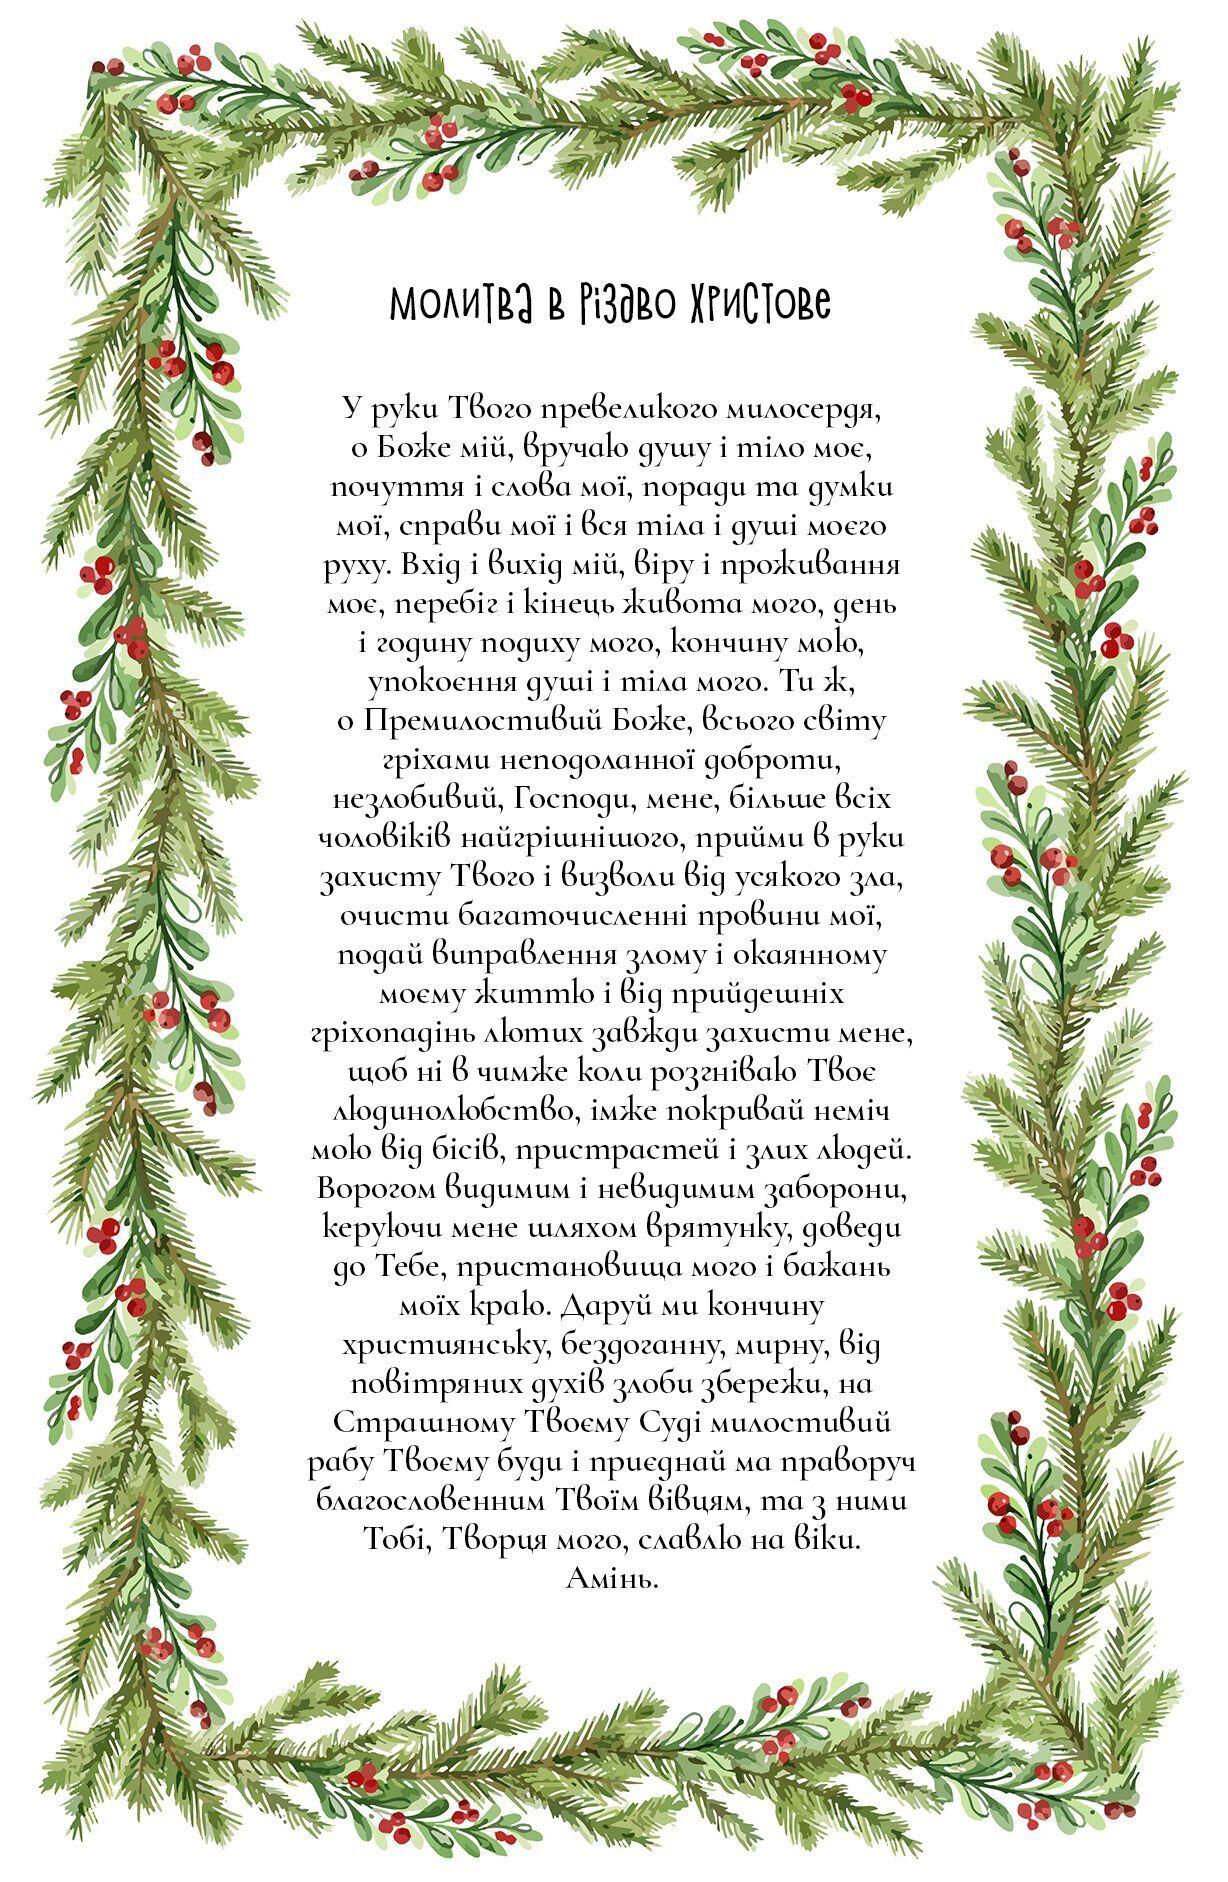 Молитва в Різдво Христове